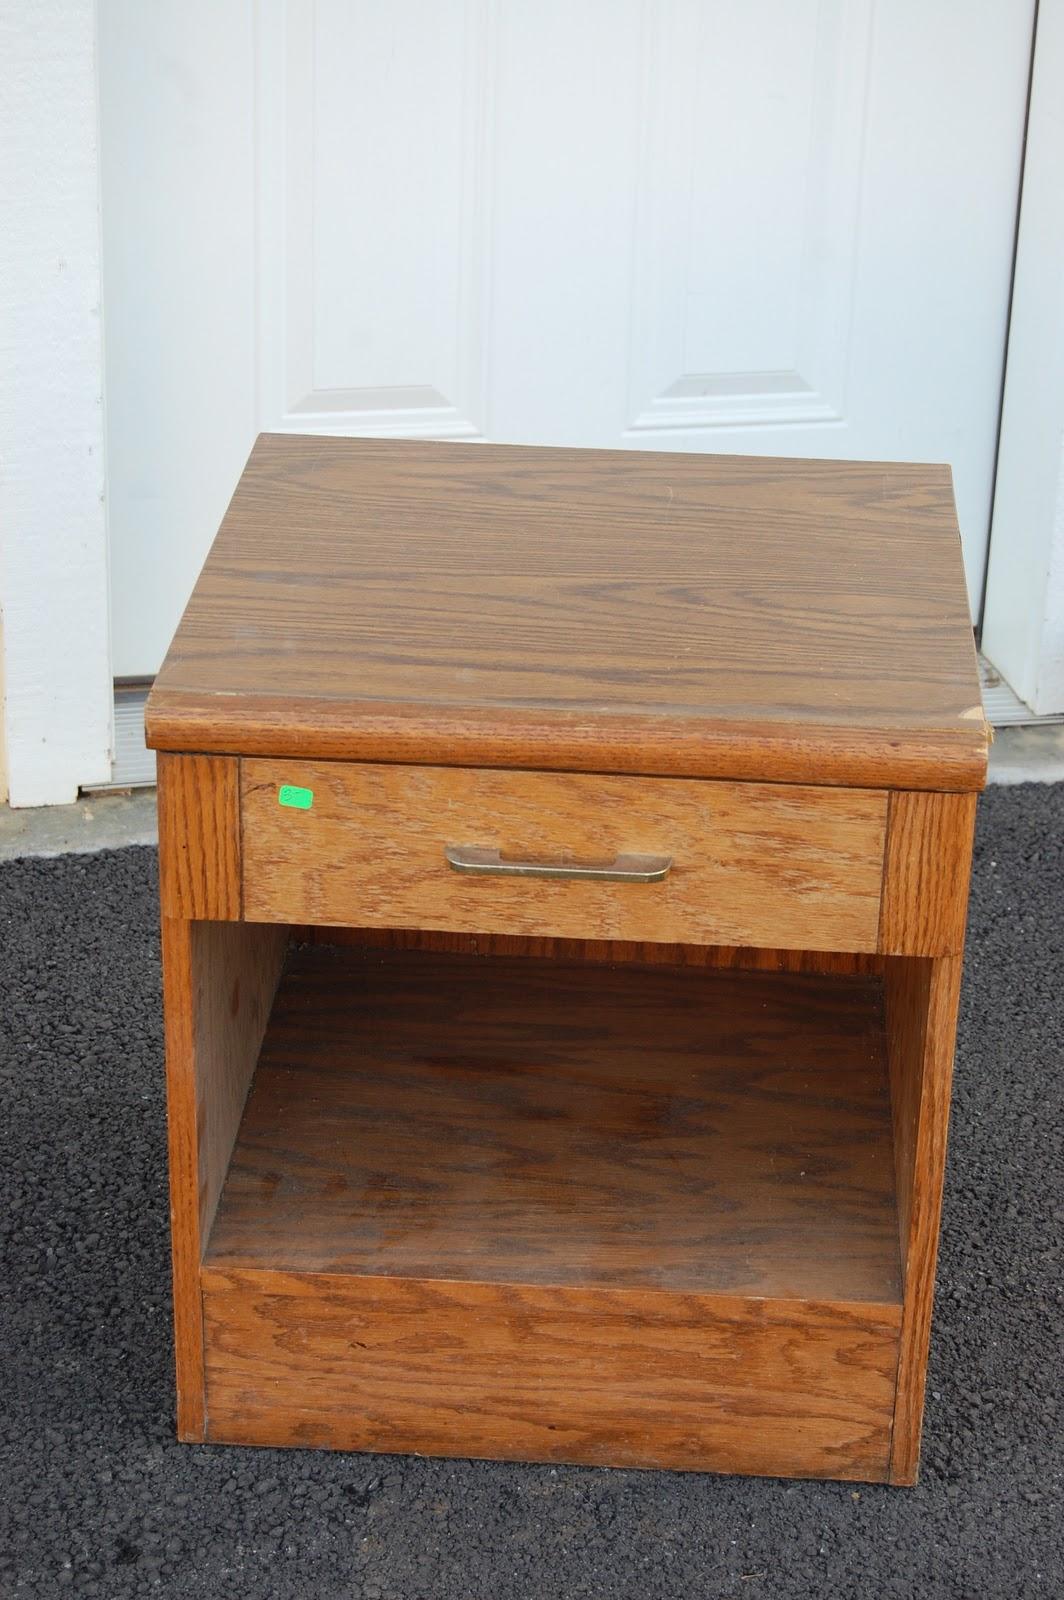 Nightstand Repurposed It S Now A Kids Workbench Design